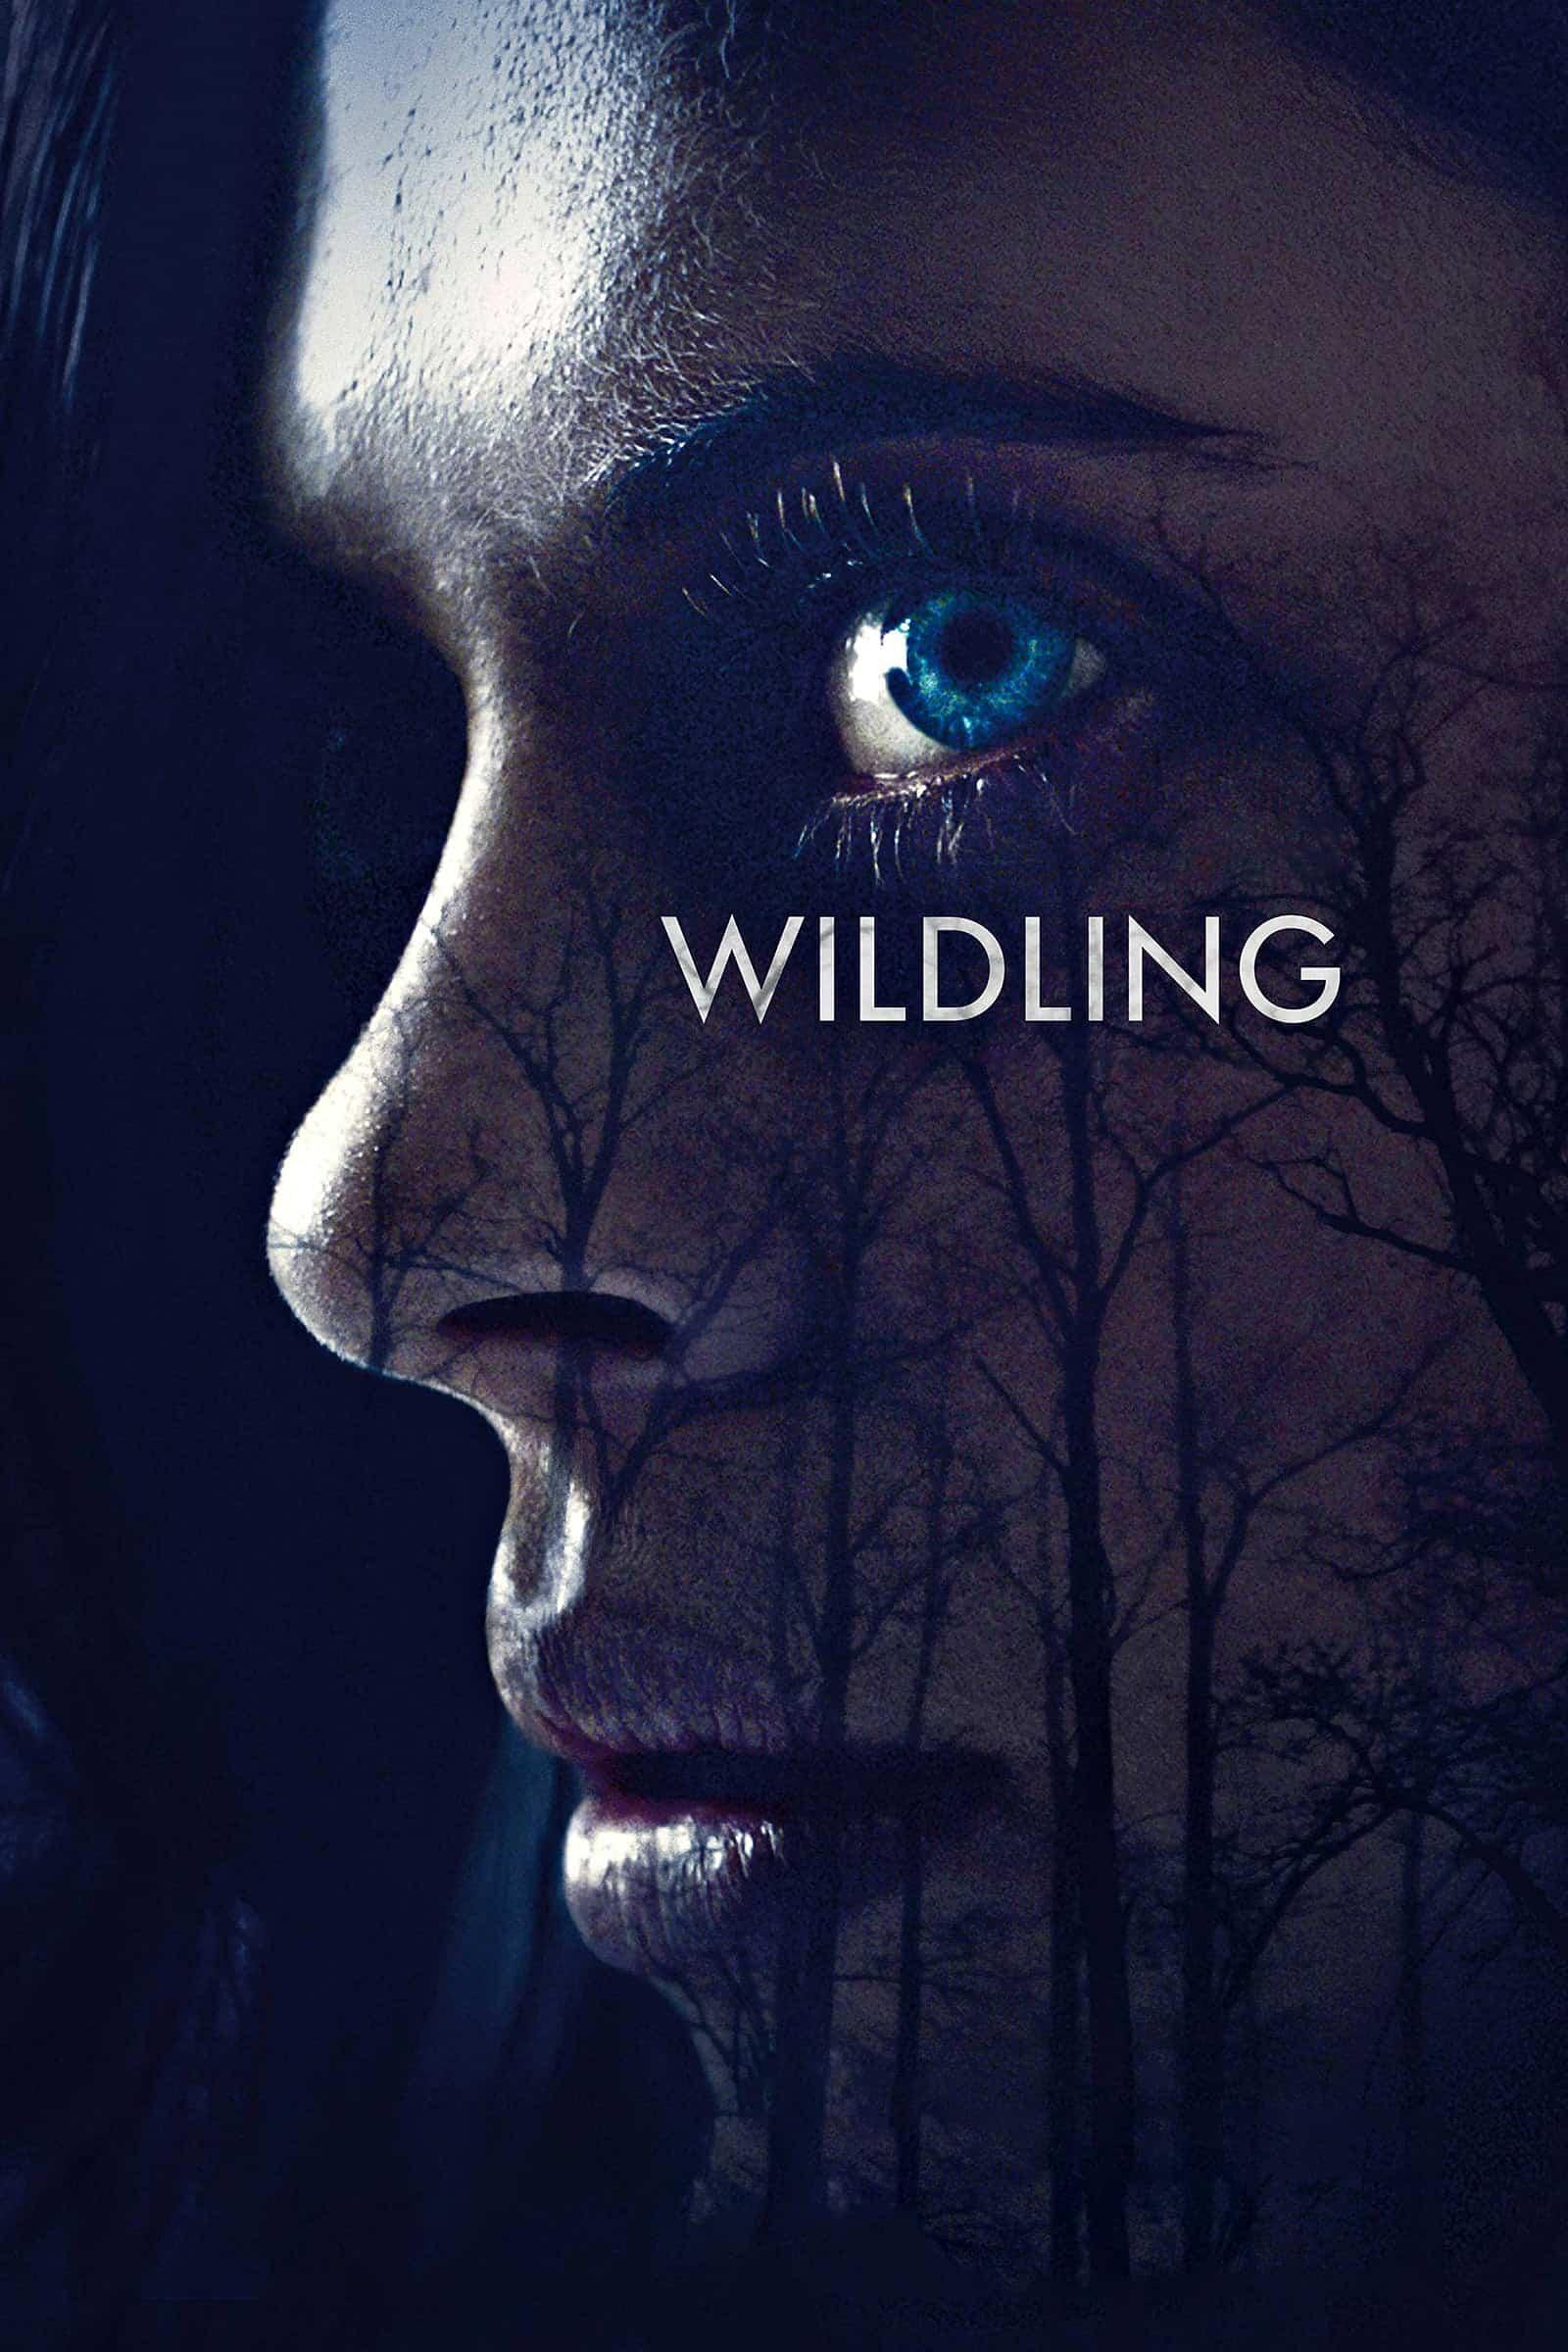 Wildling, 2018